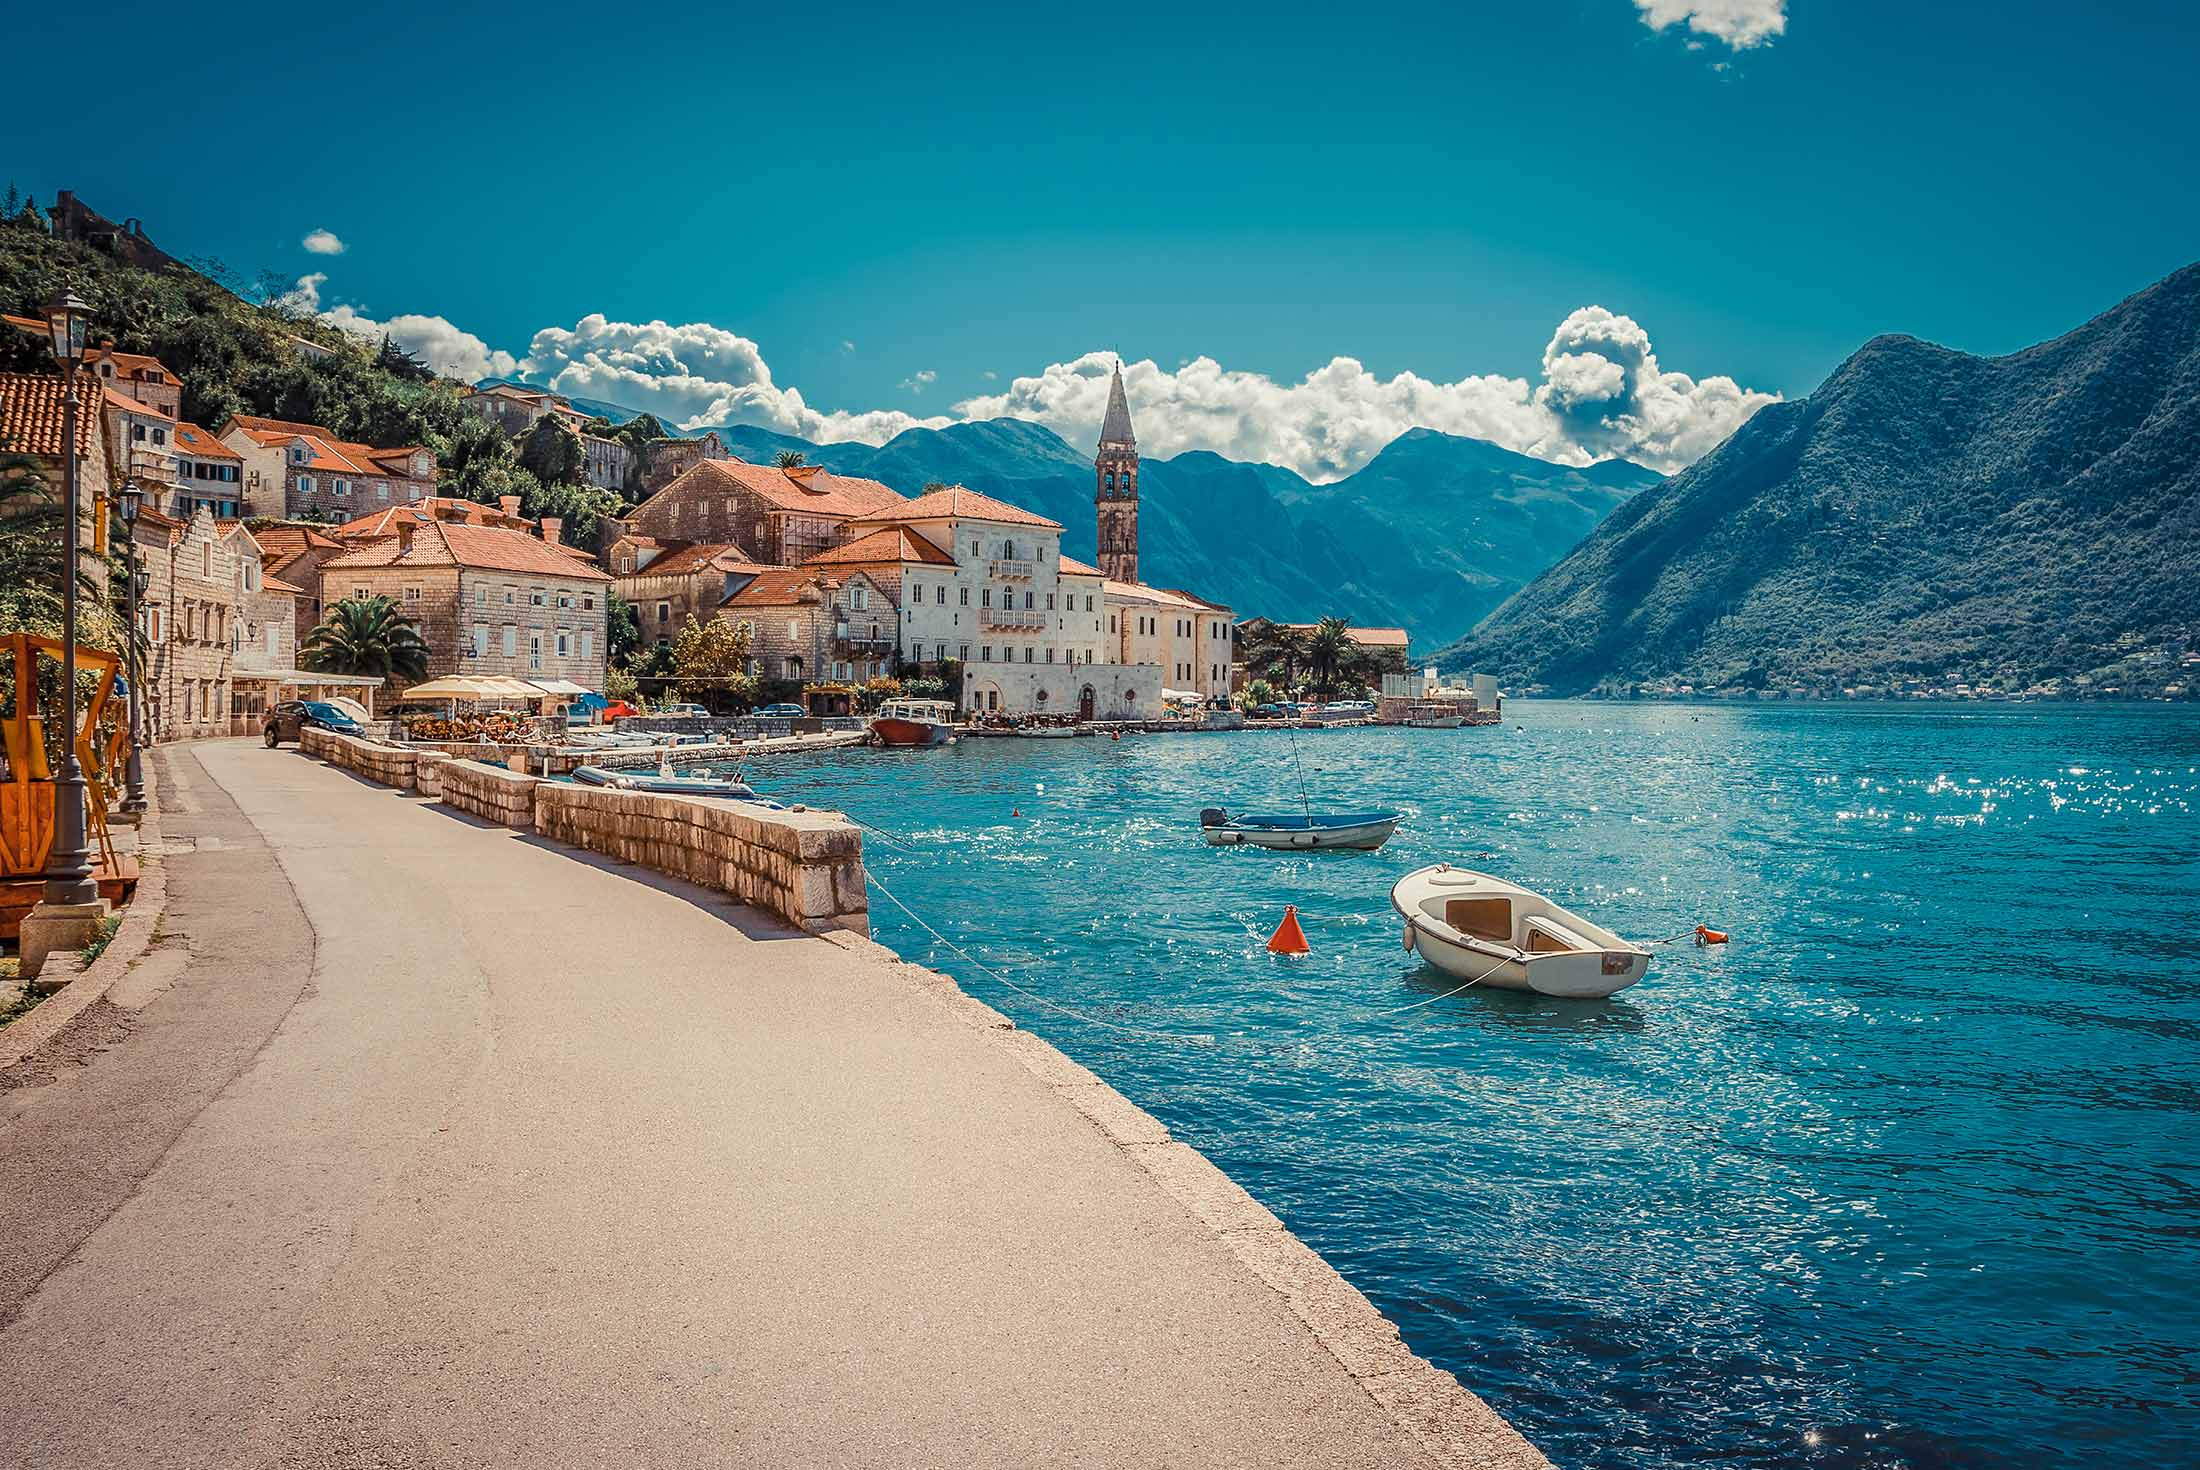 Dalmatia & Western Balkan Discovery 4